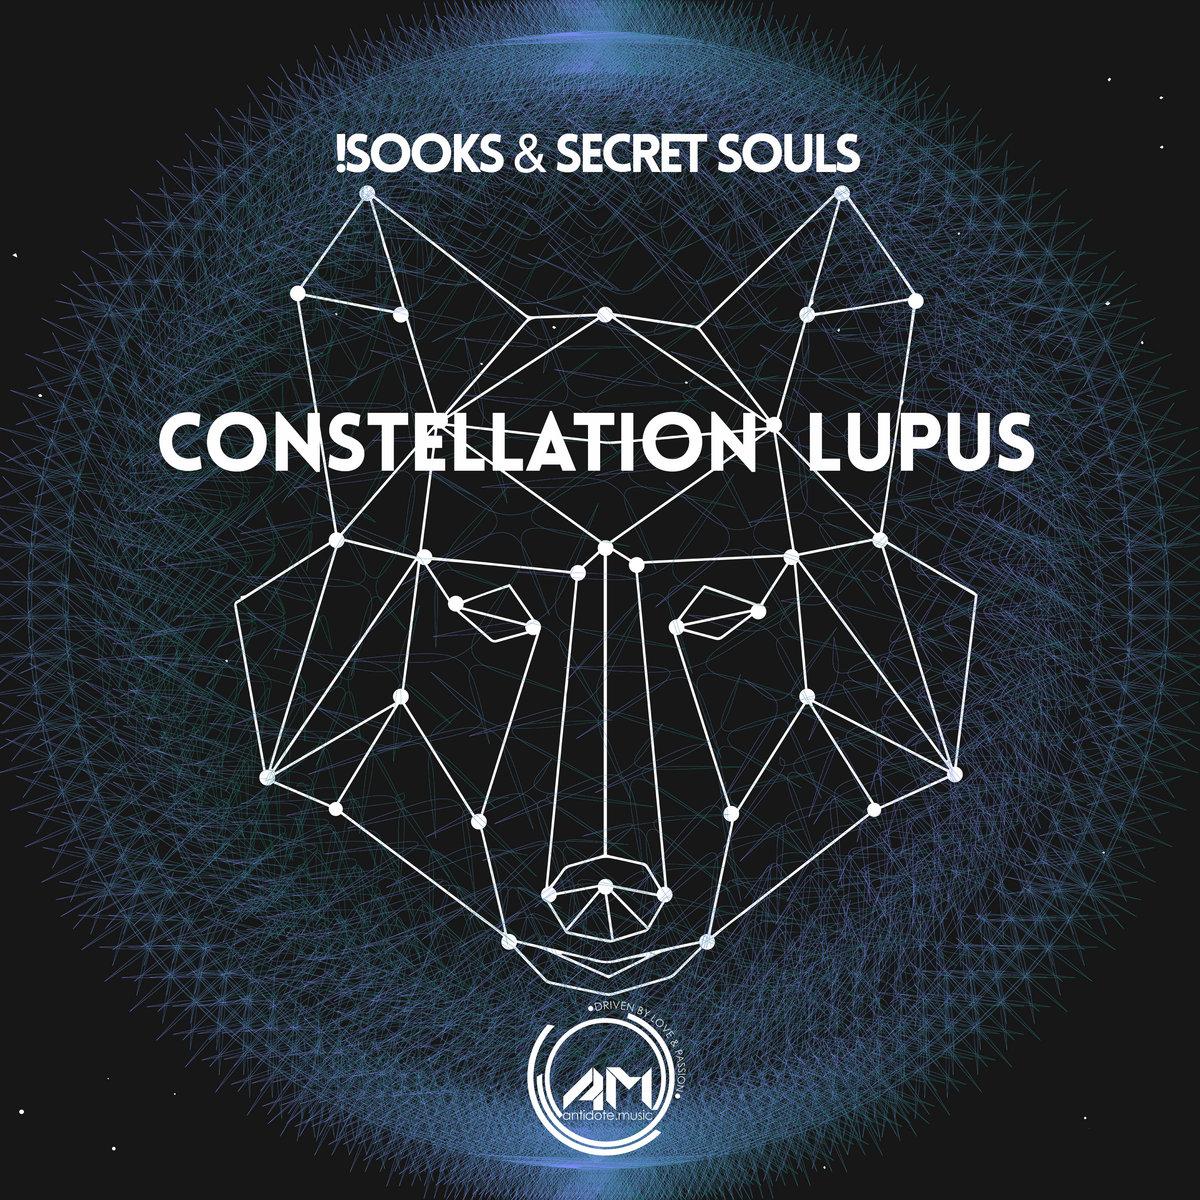 Constellation Lupus Antidote Music